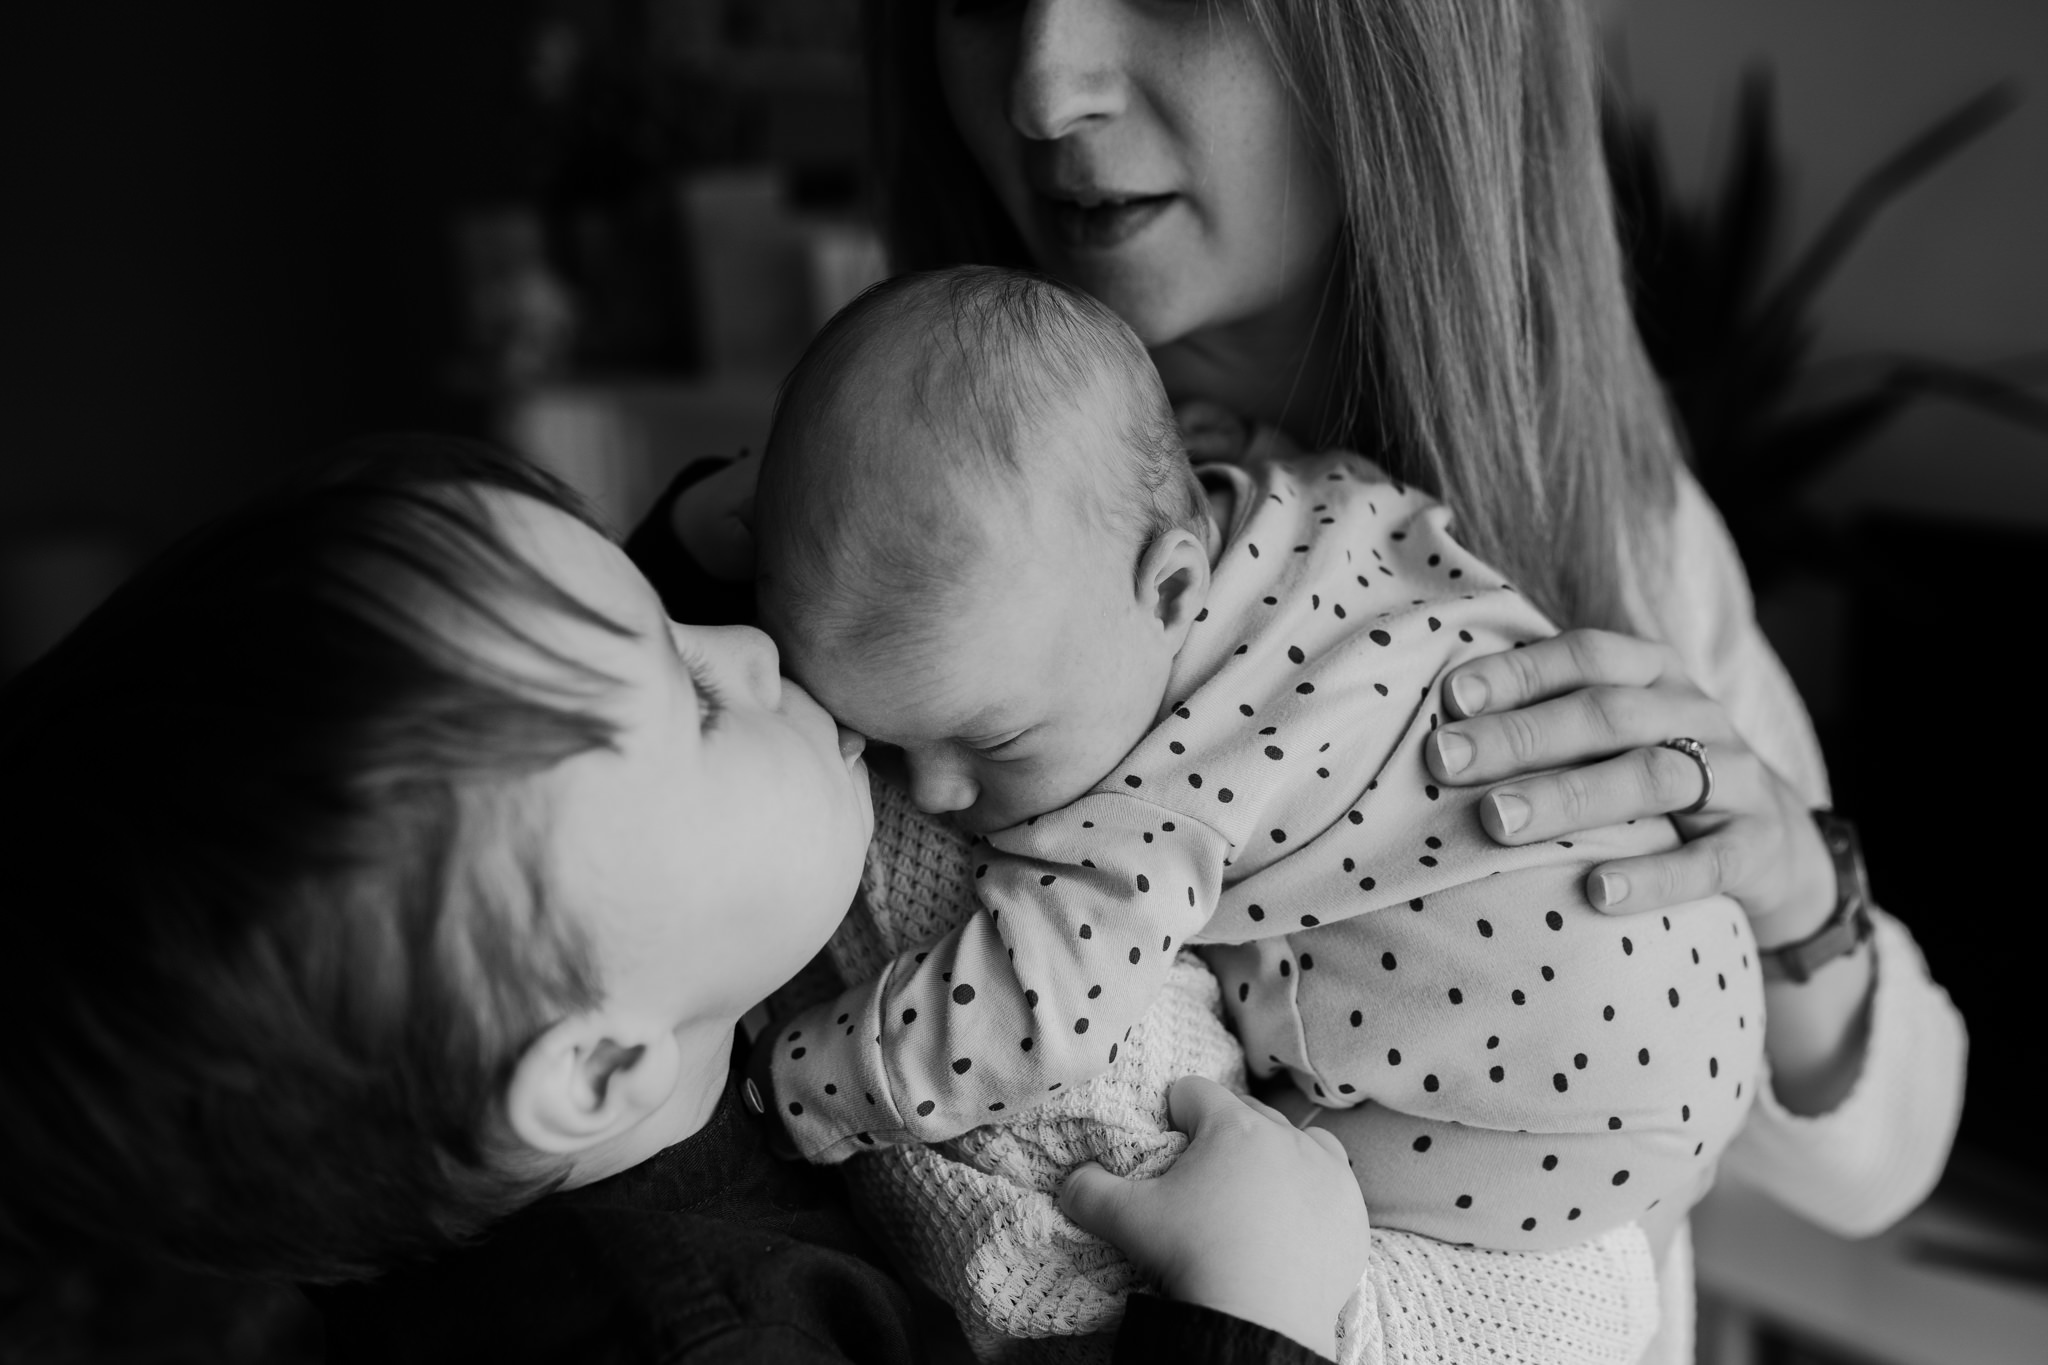 family-photo-session-newborn-photographer-NI